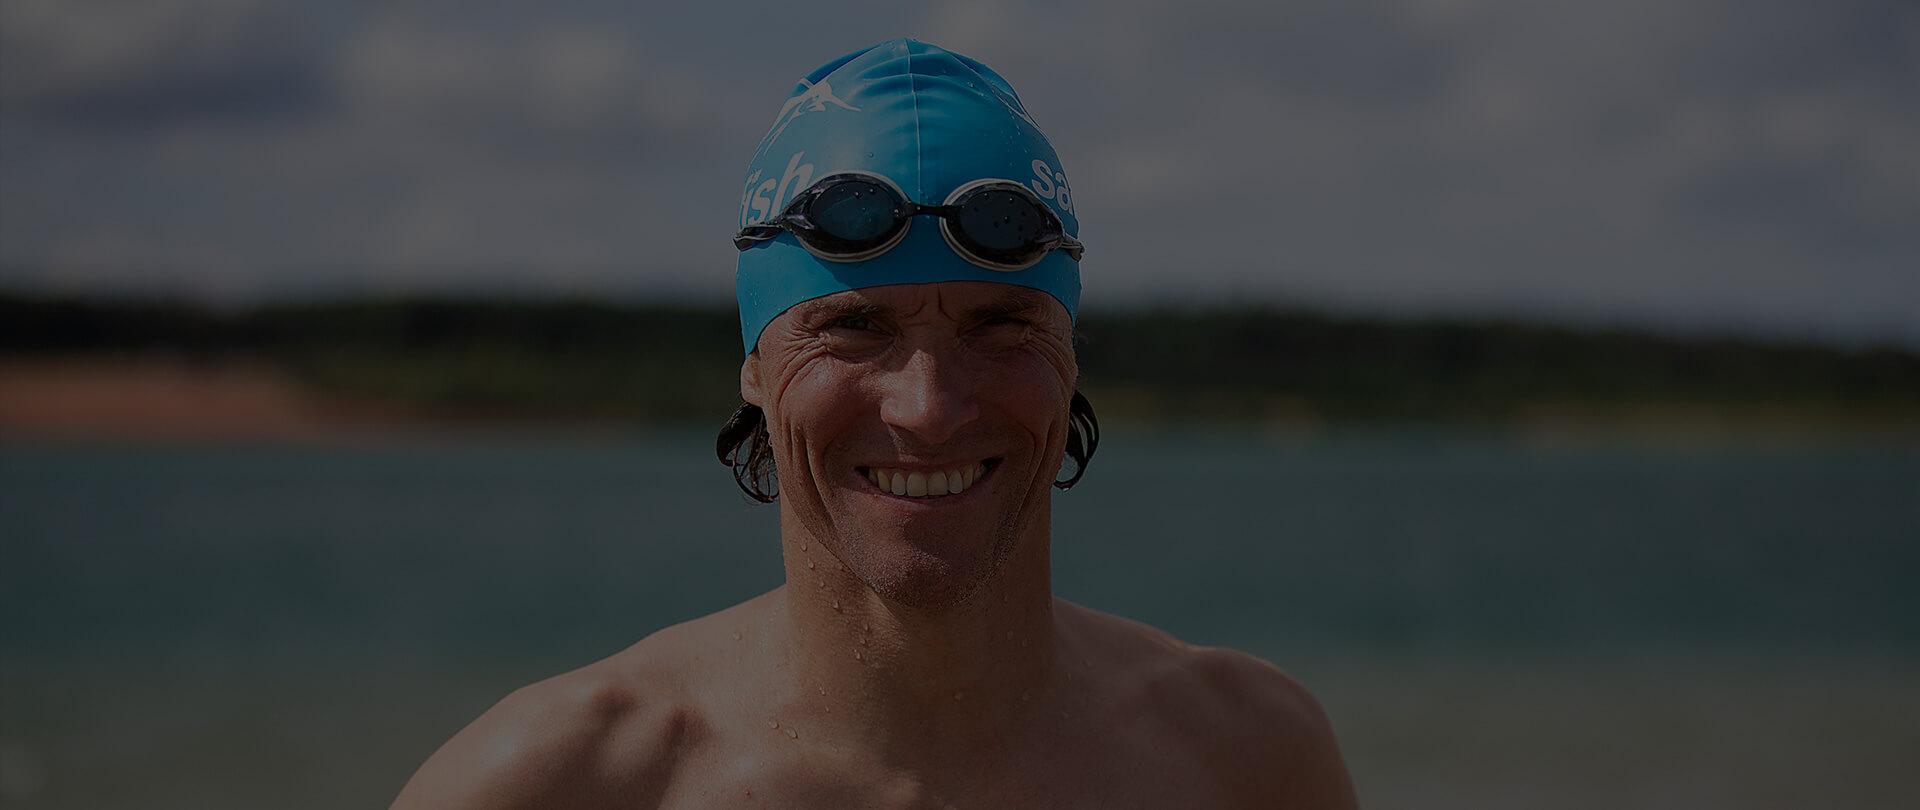 Andreas Raelert